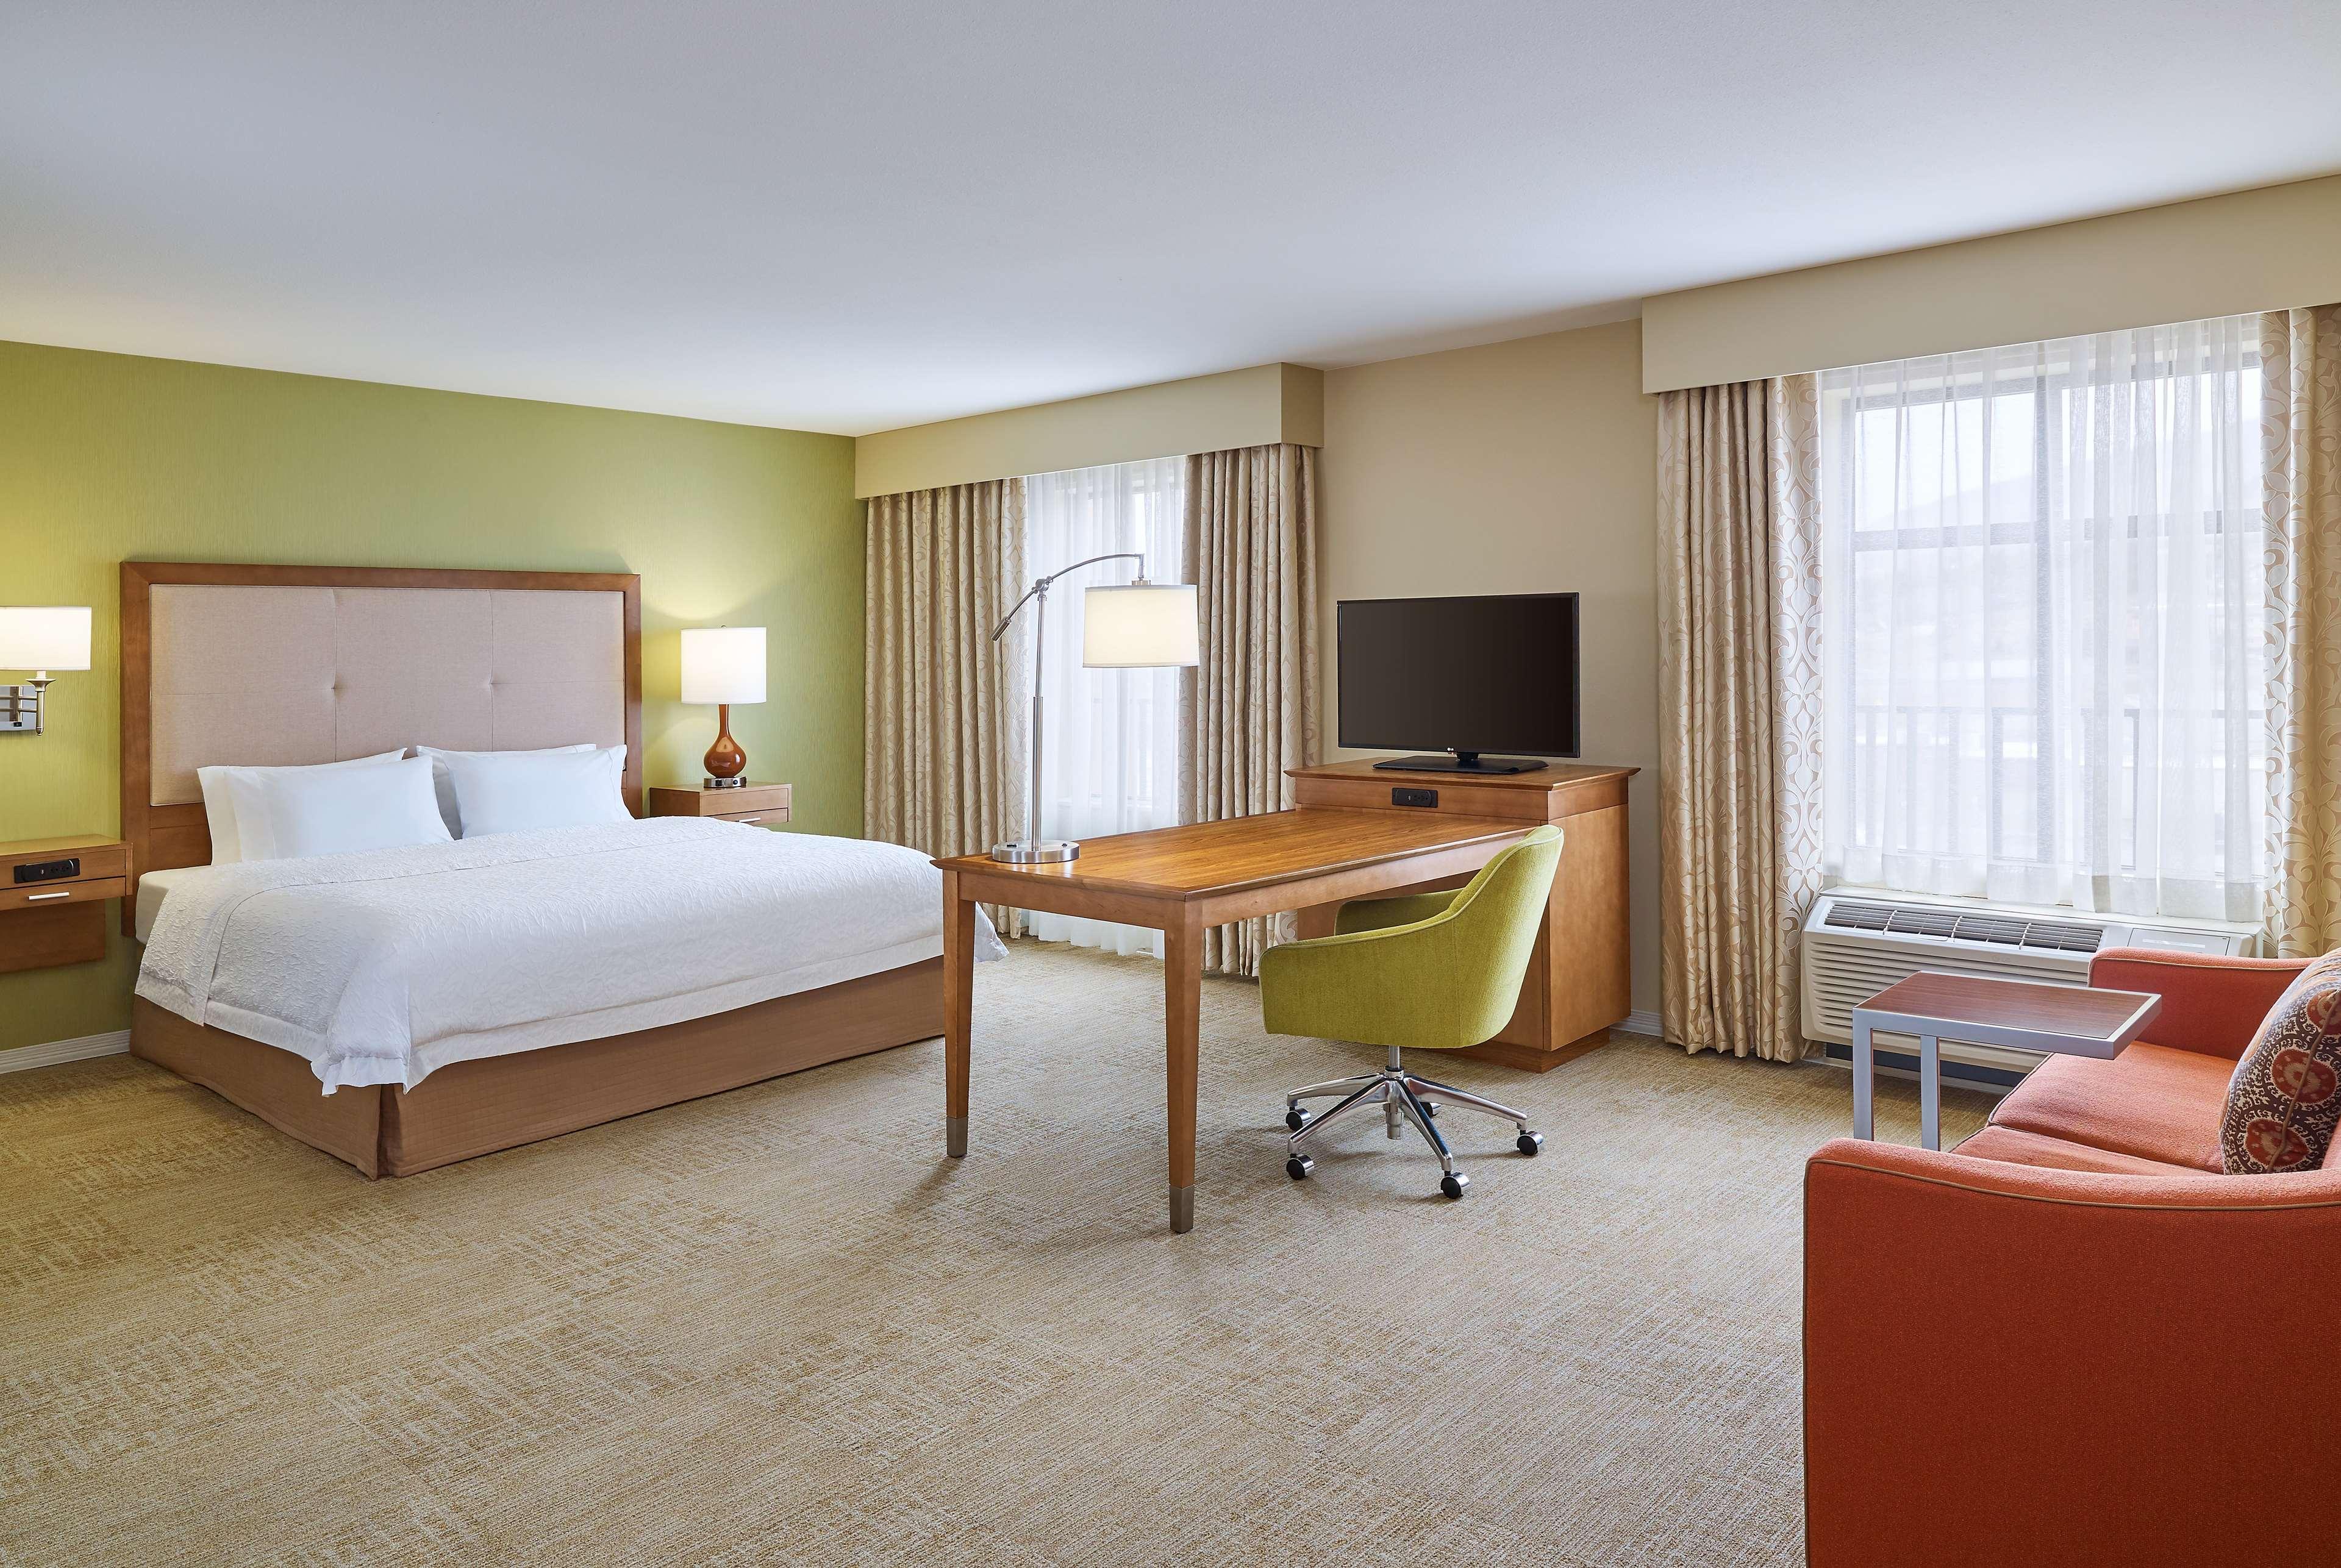 Hampton Inn & Suites Silverthorne image 31